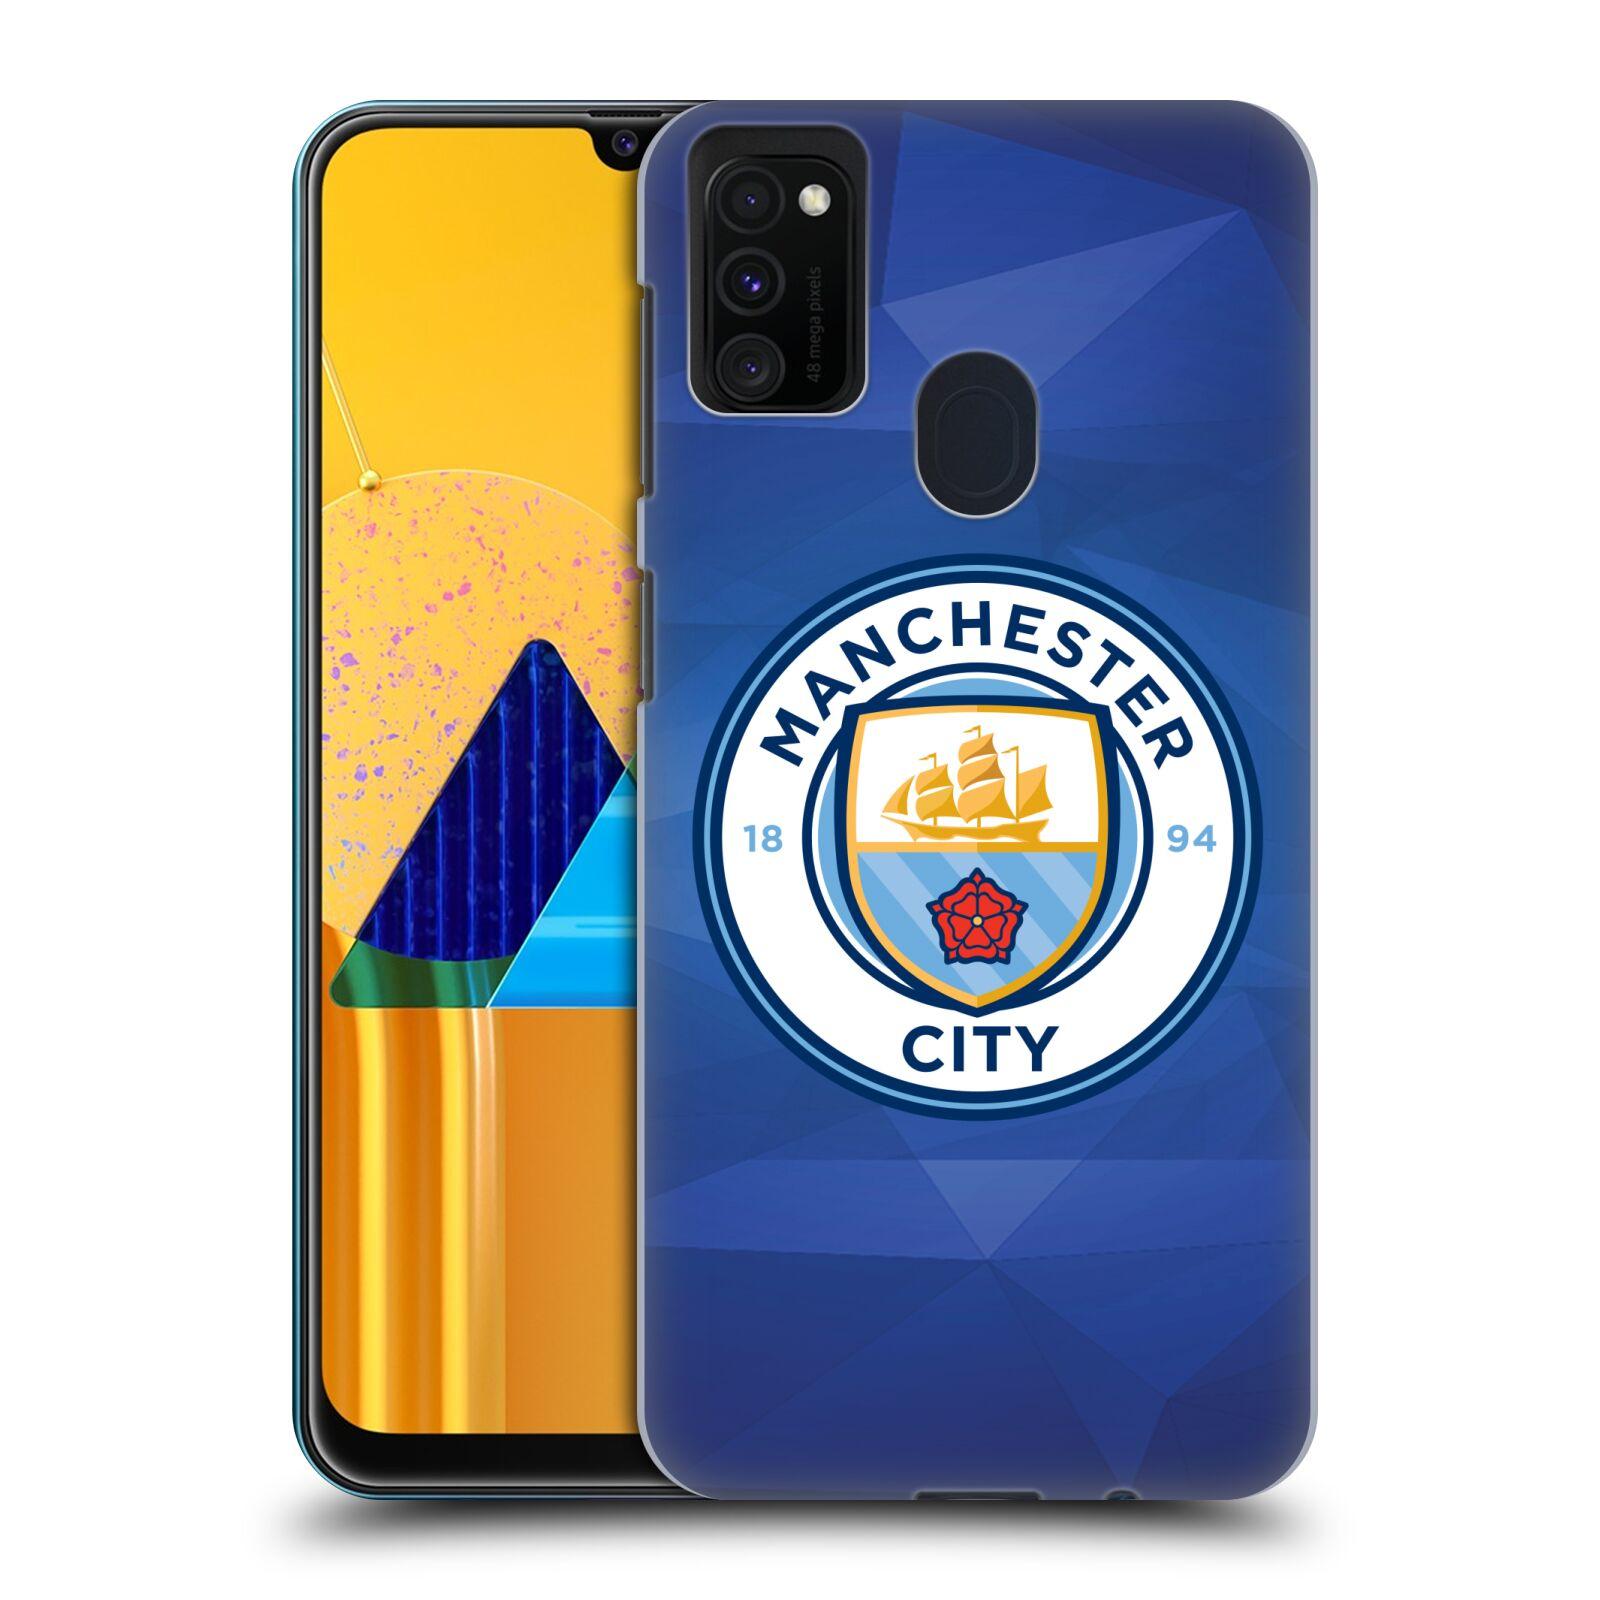 Plastové pouzdro na mobil Samsung Galaxy M21 - Head Case - Manchester City FC - Modré nové logo